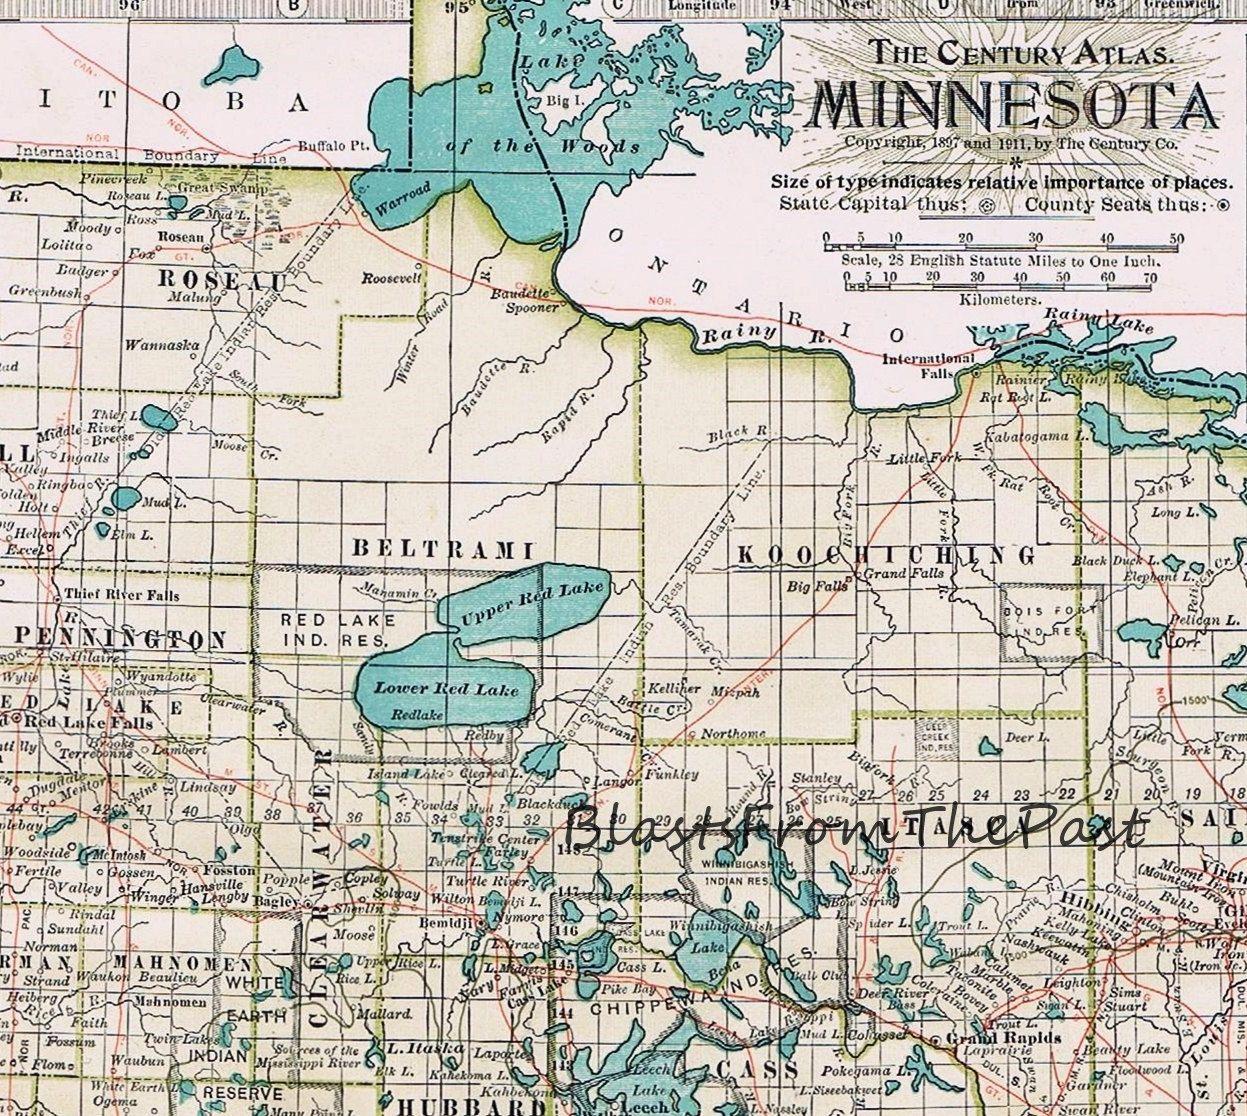 1911 Antique MAP of MINNESOTA Authentic Large Scale Century Atlas